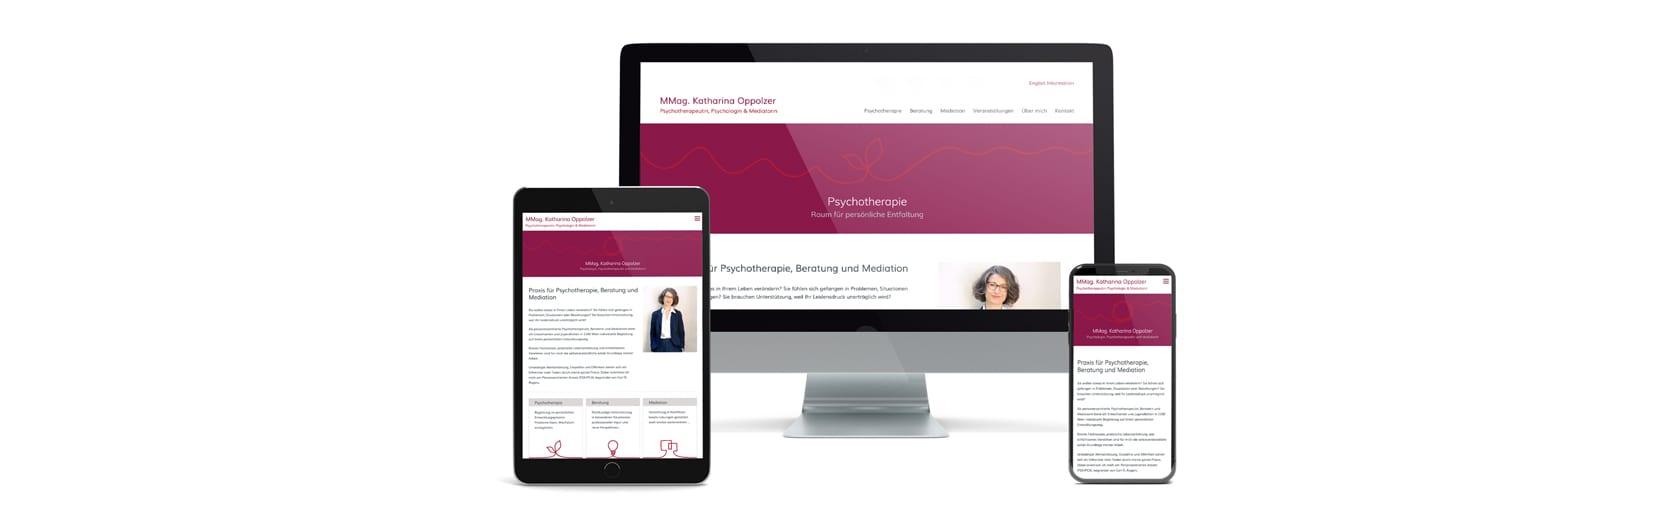 Psychotherapie Homepage erstellen lassen bei Webdesign Wien